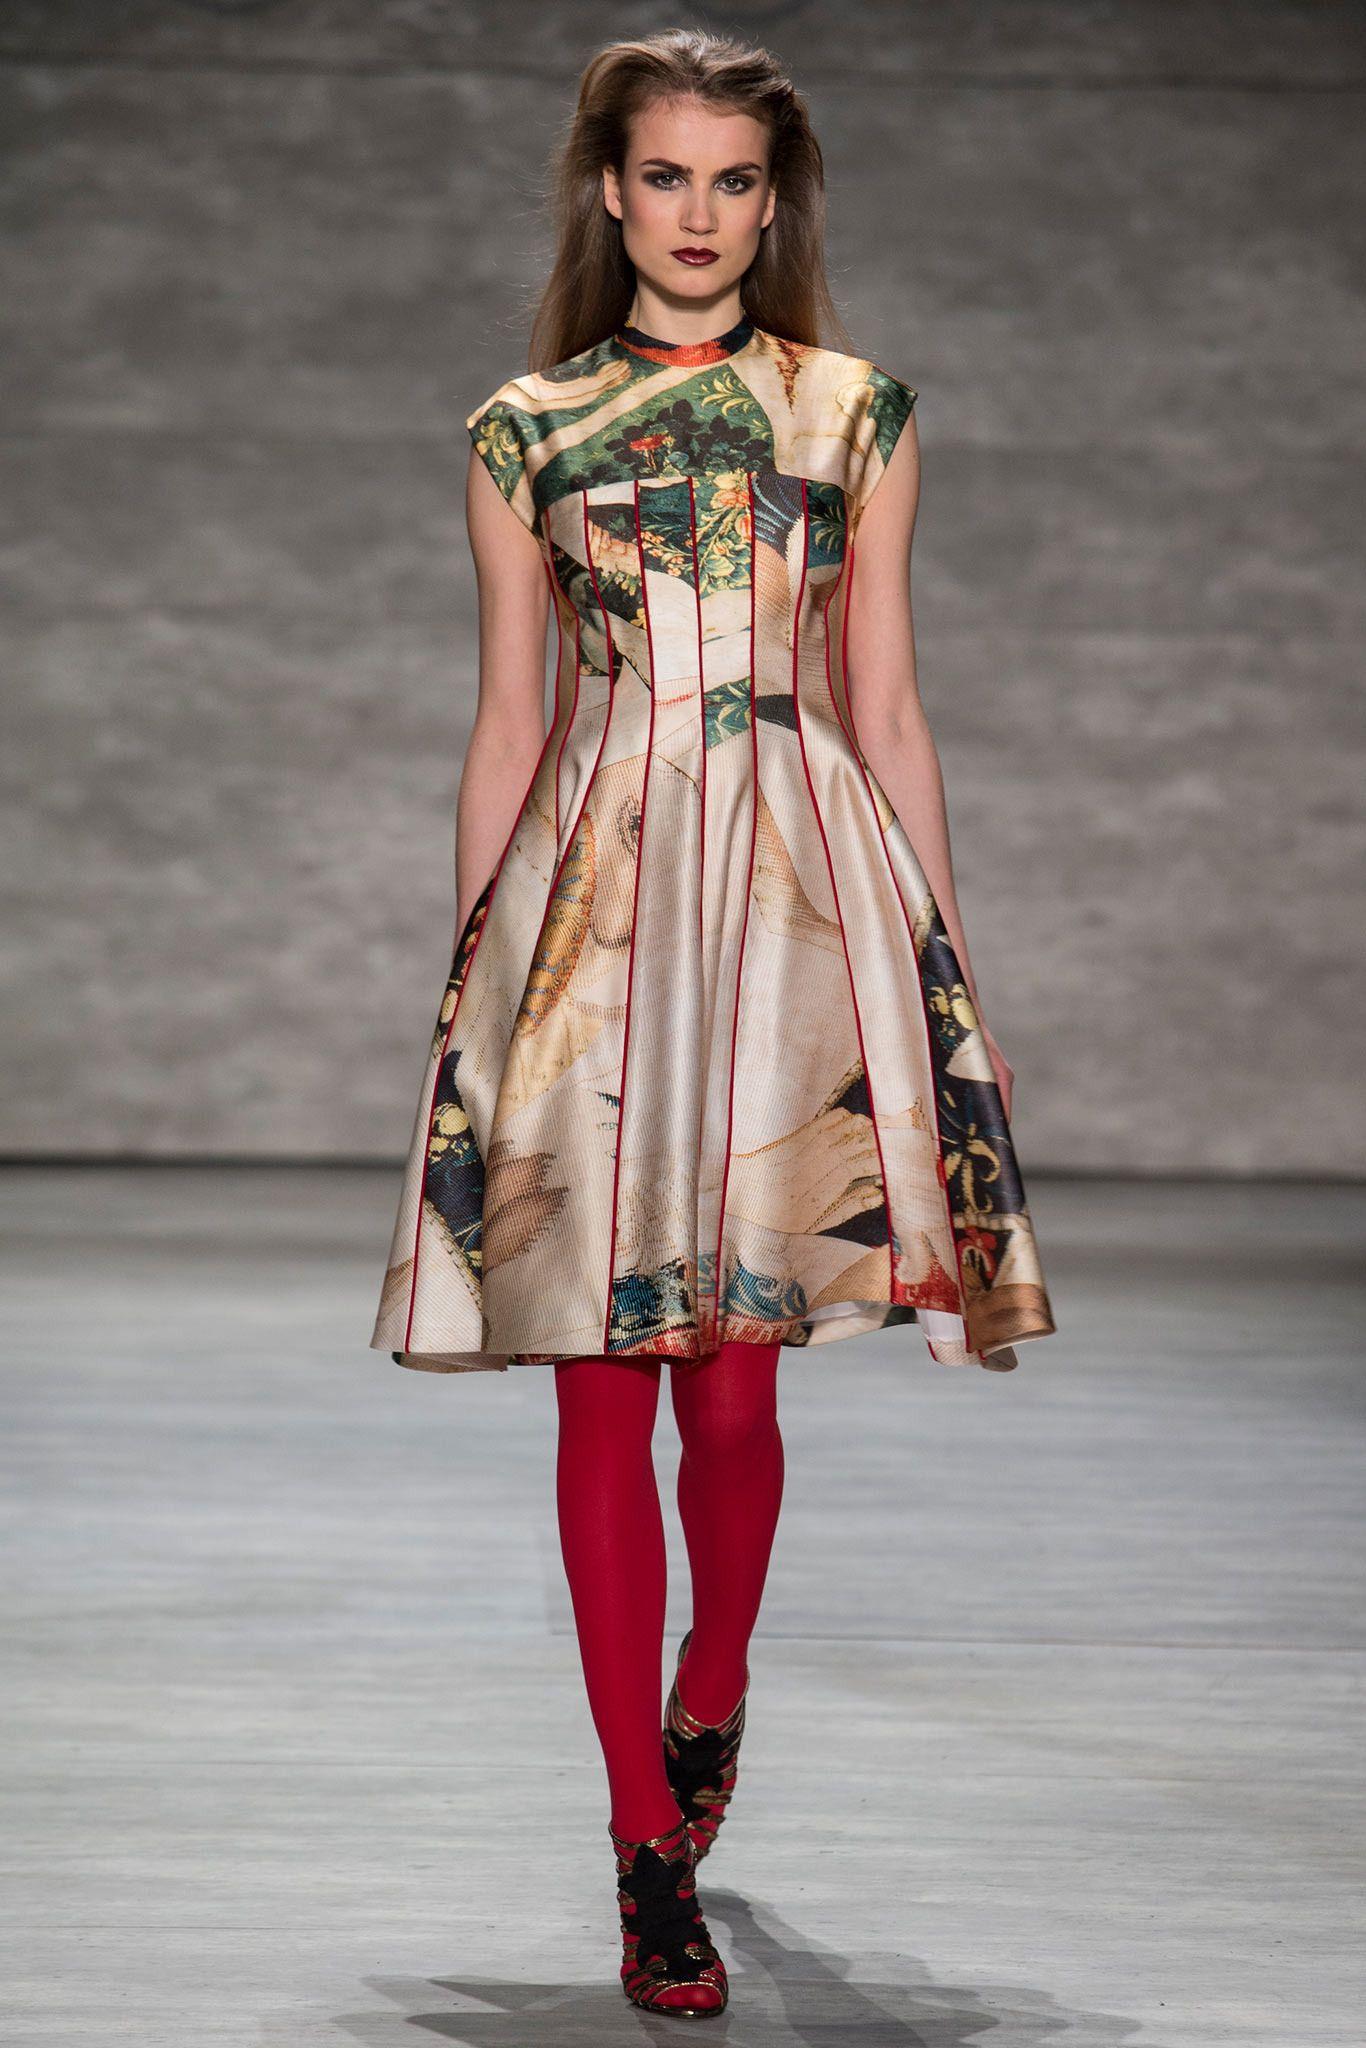 Ruffian FallWinter 2014-2015 Collection – New York Fashion Week